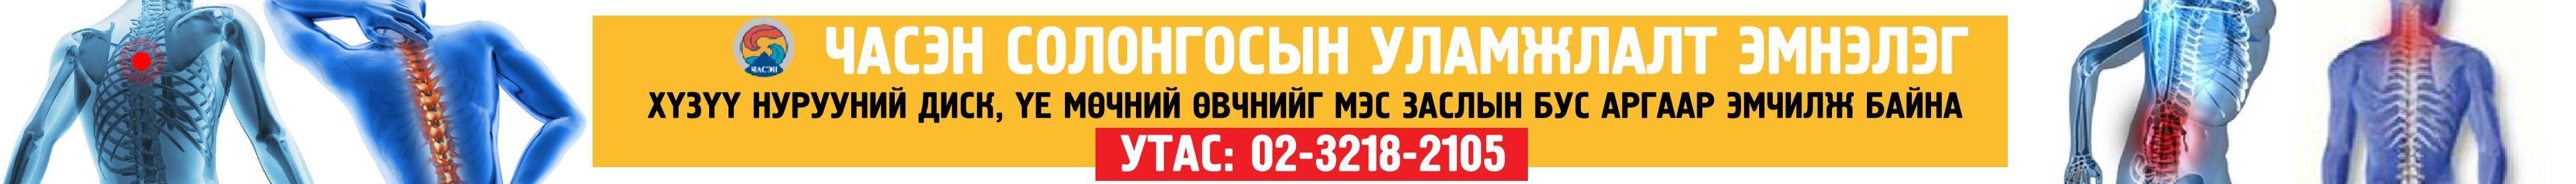 17269779_1634738293208230_1265770993_o.jpg